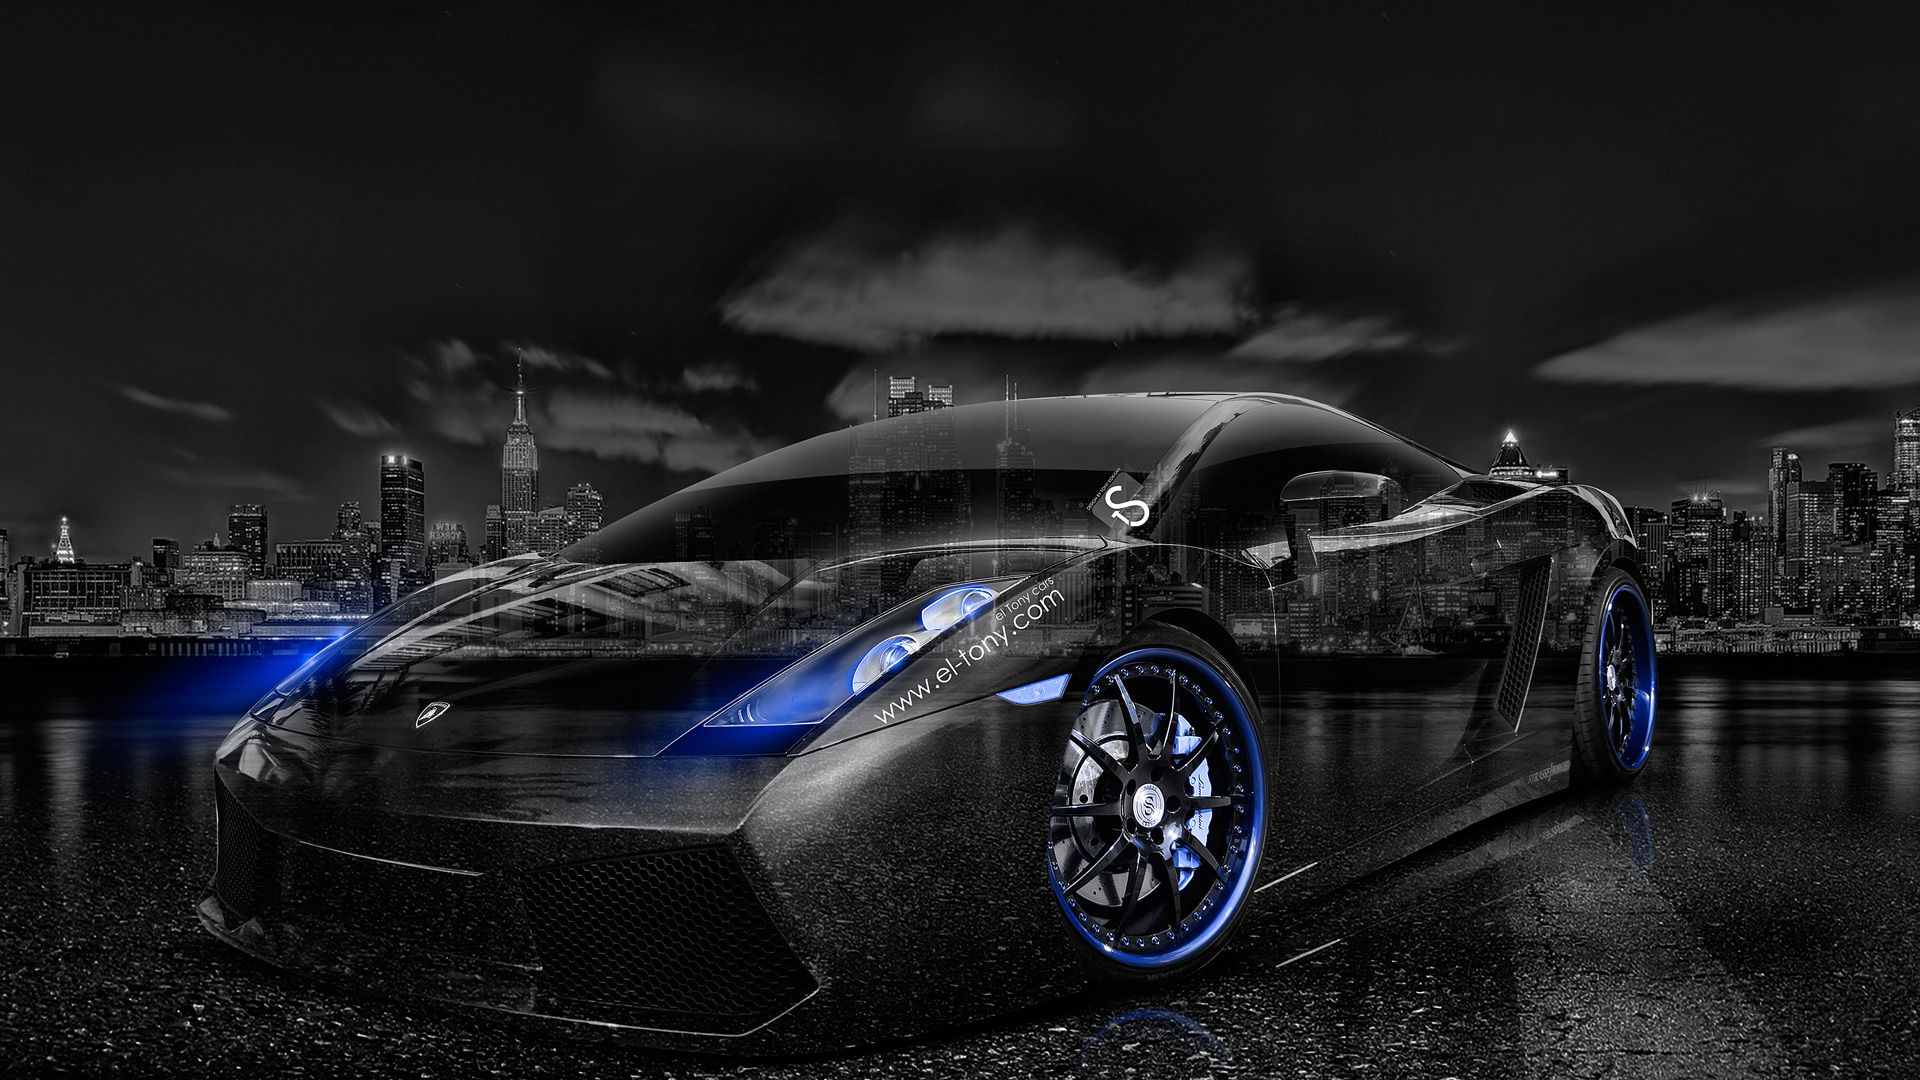 Lamborghini Gallardo Back Abstract Car Design By Tony Kokhan Wallpapers) U2013  HD Desktop Wallpapers Amazing Ideas